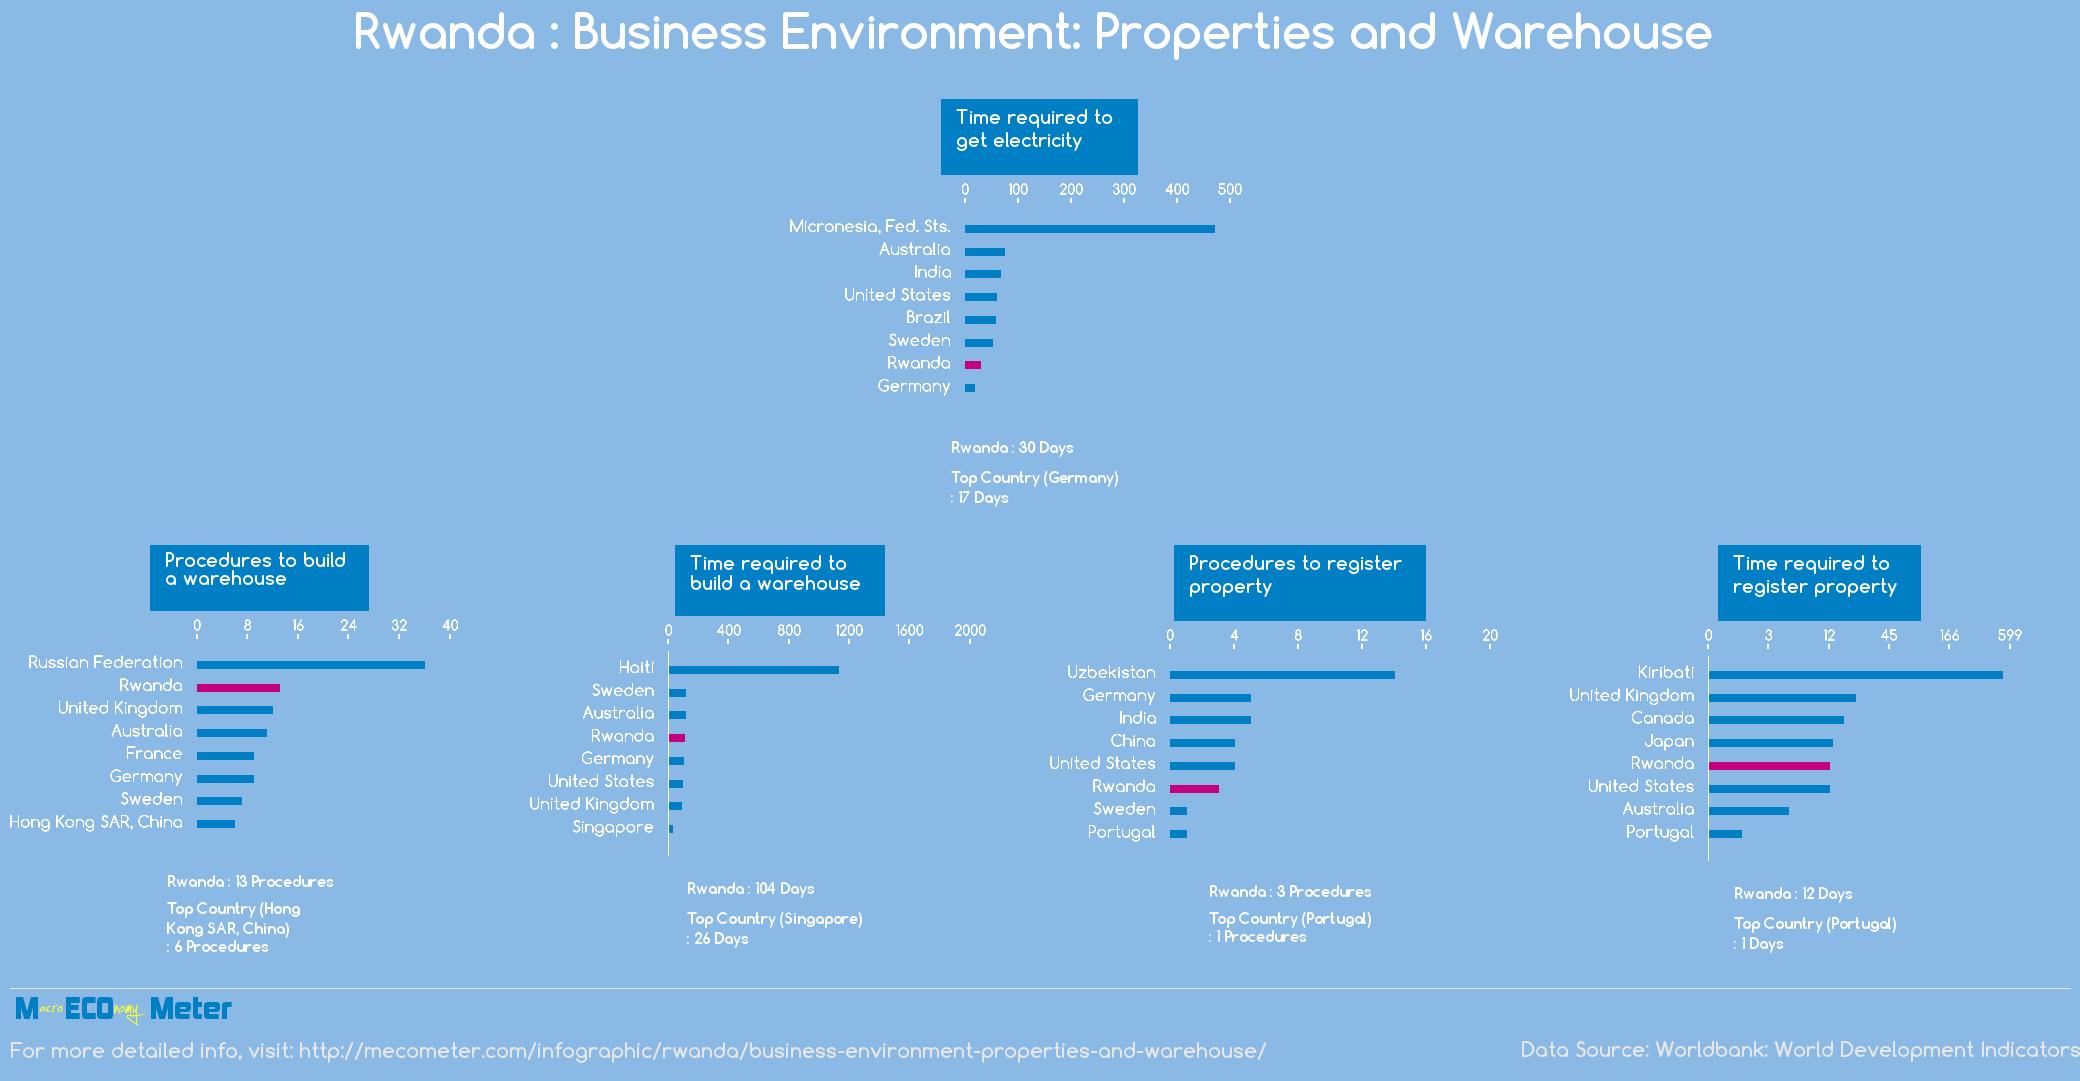 Rwanda : Business Environment: Properties and Warehouse